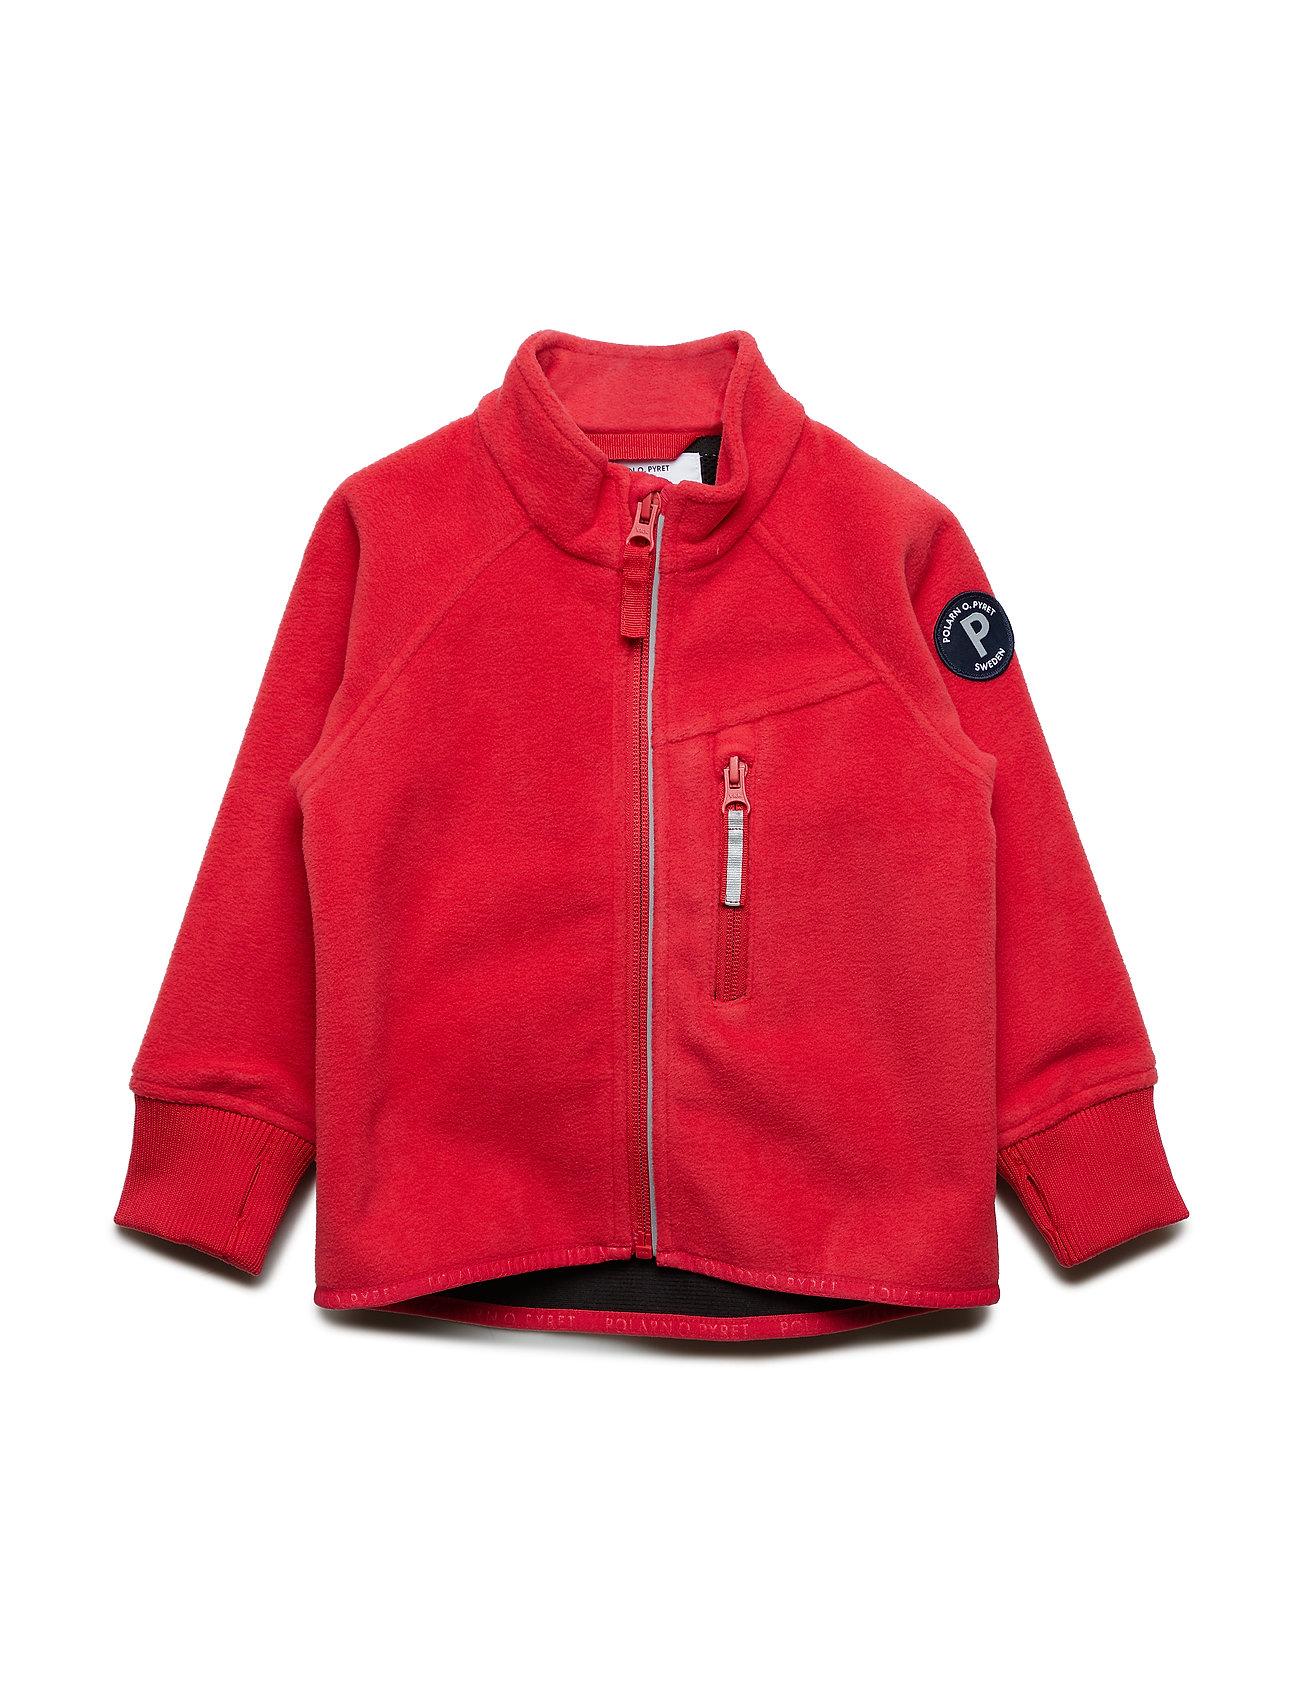 Polarn O. Pyret Jacket Windfleece Solid Preschool - RIBBON RED